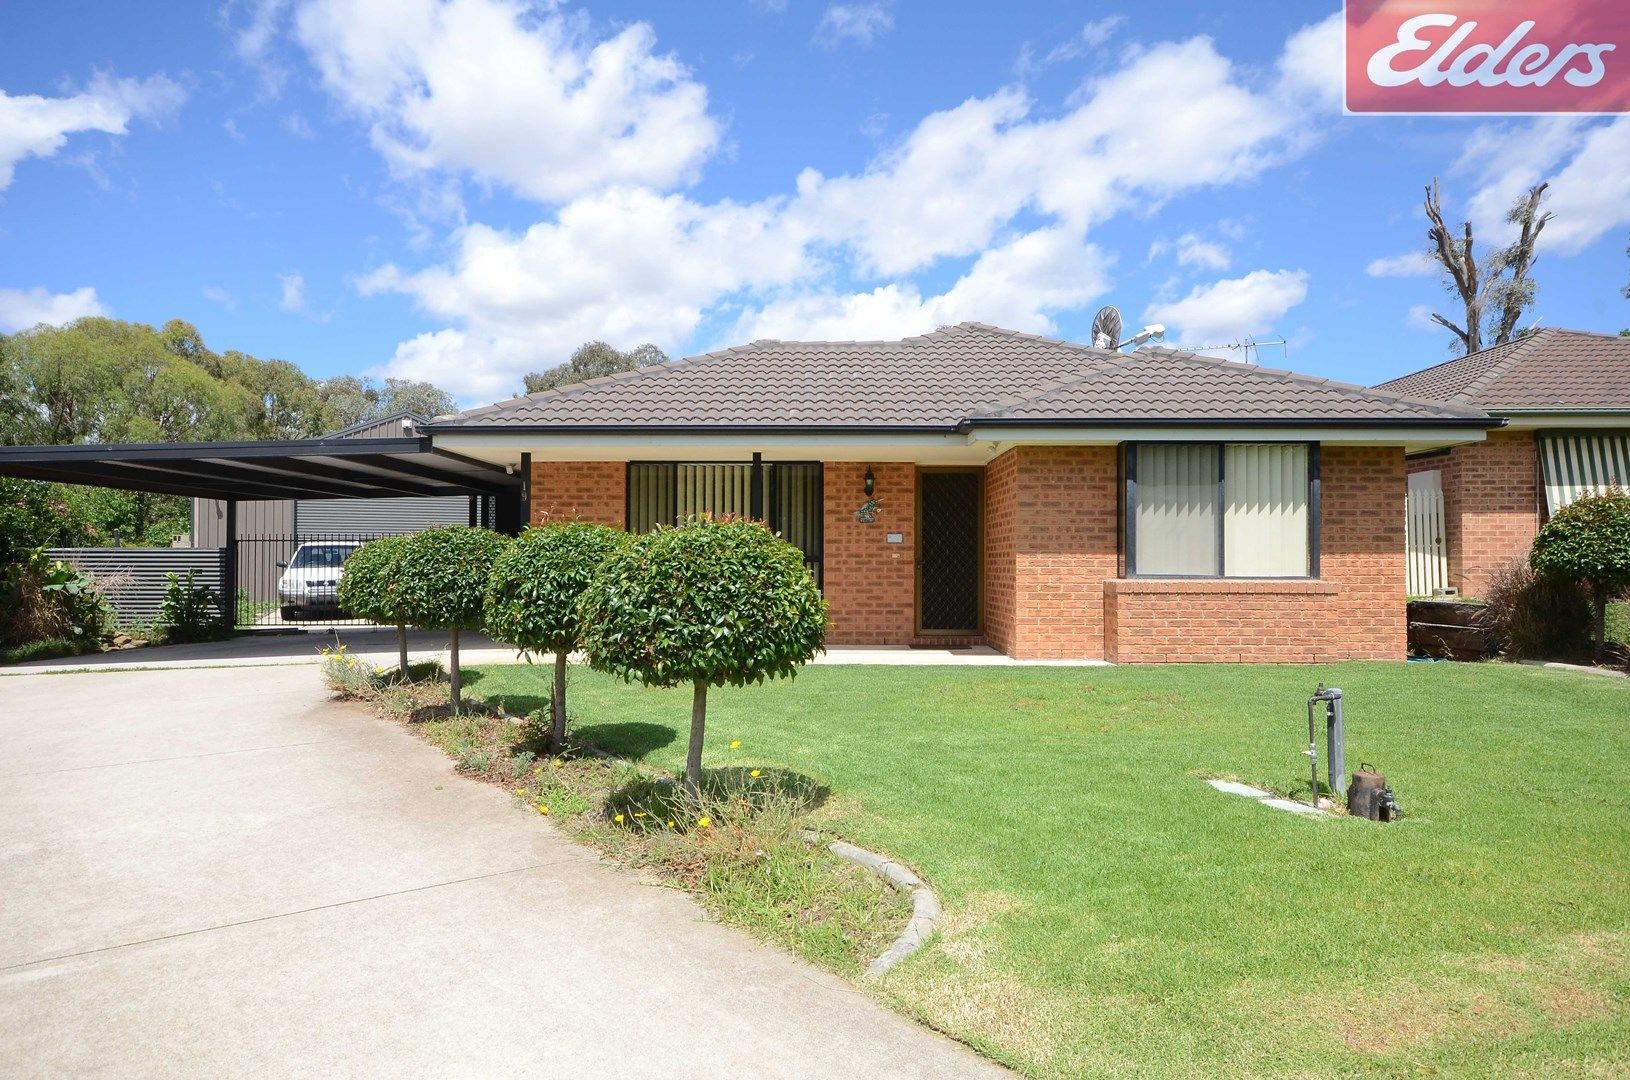 19 Wattle Way, West Albury NSW 2640, Image 0